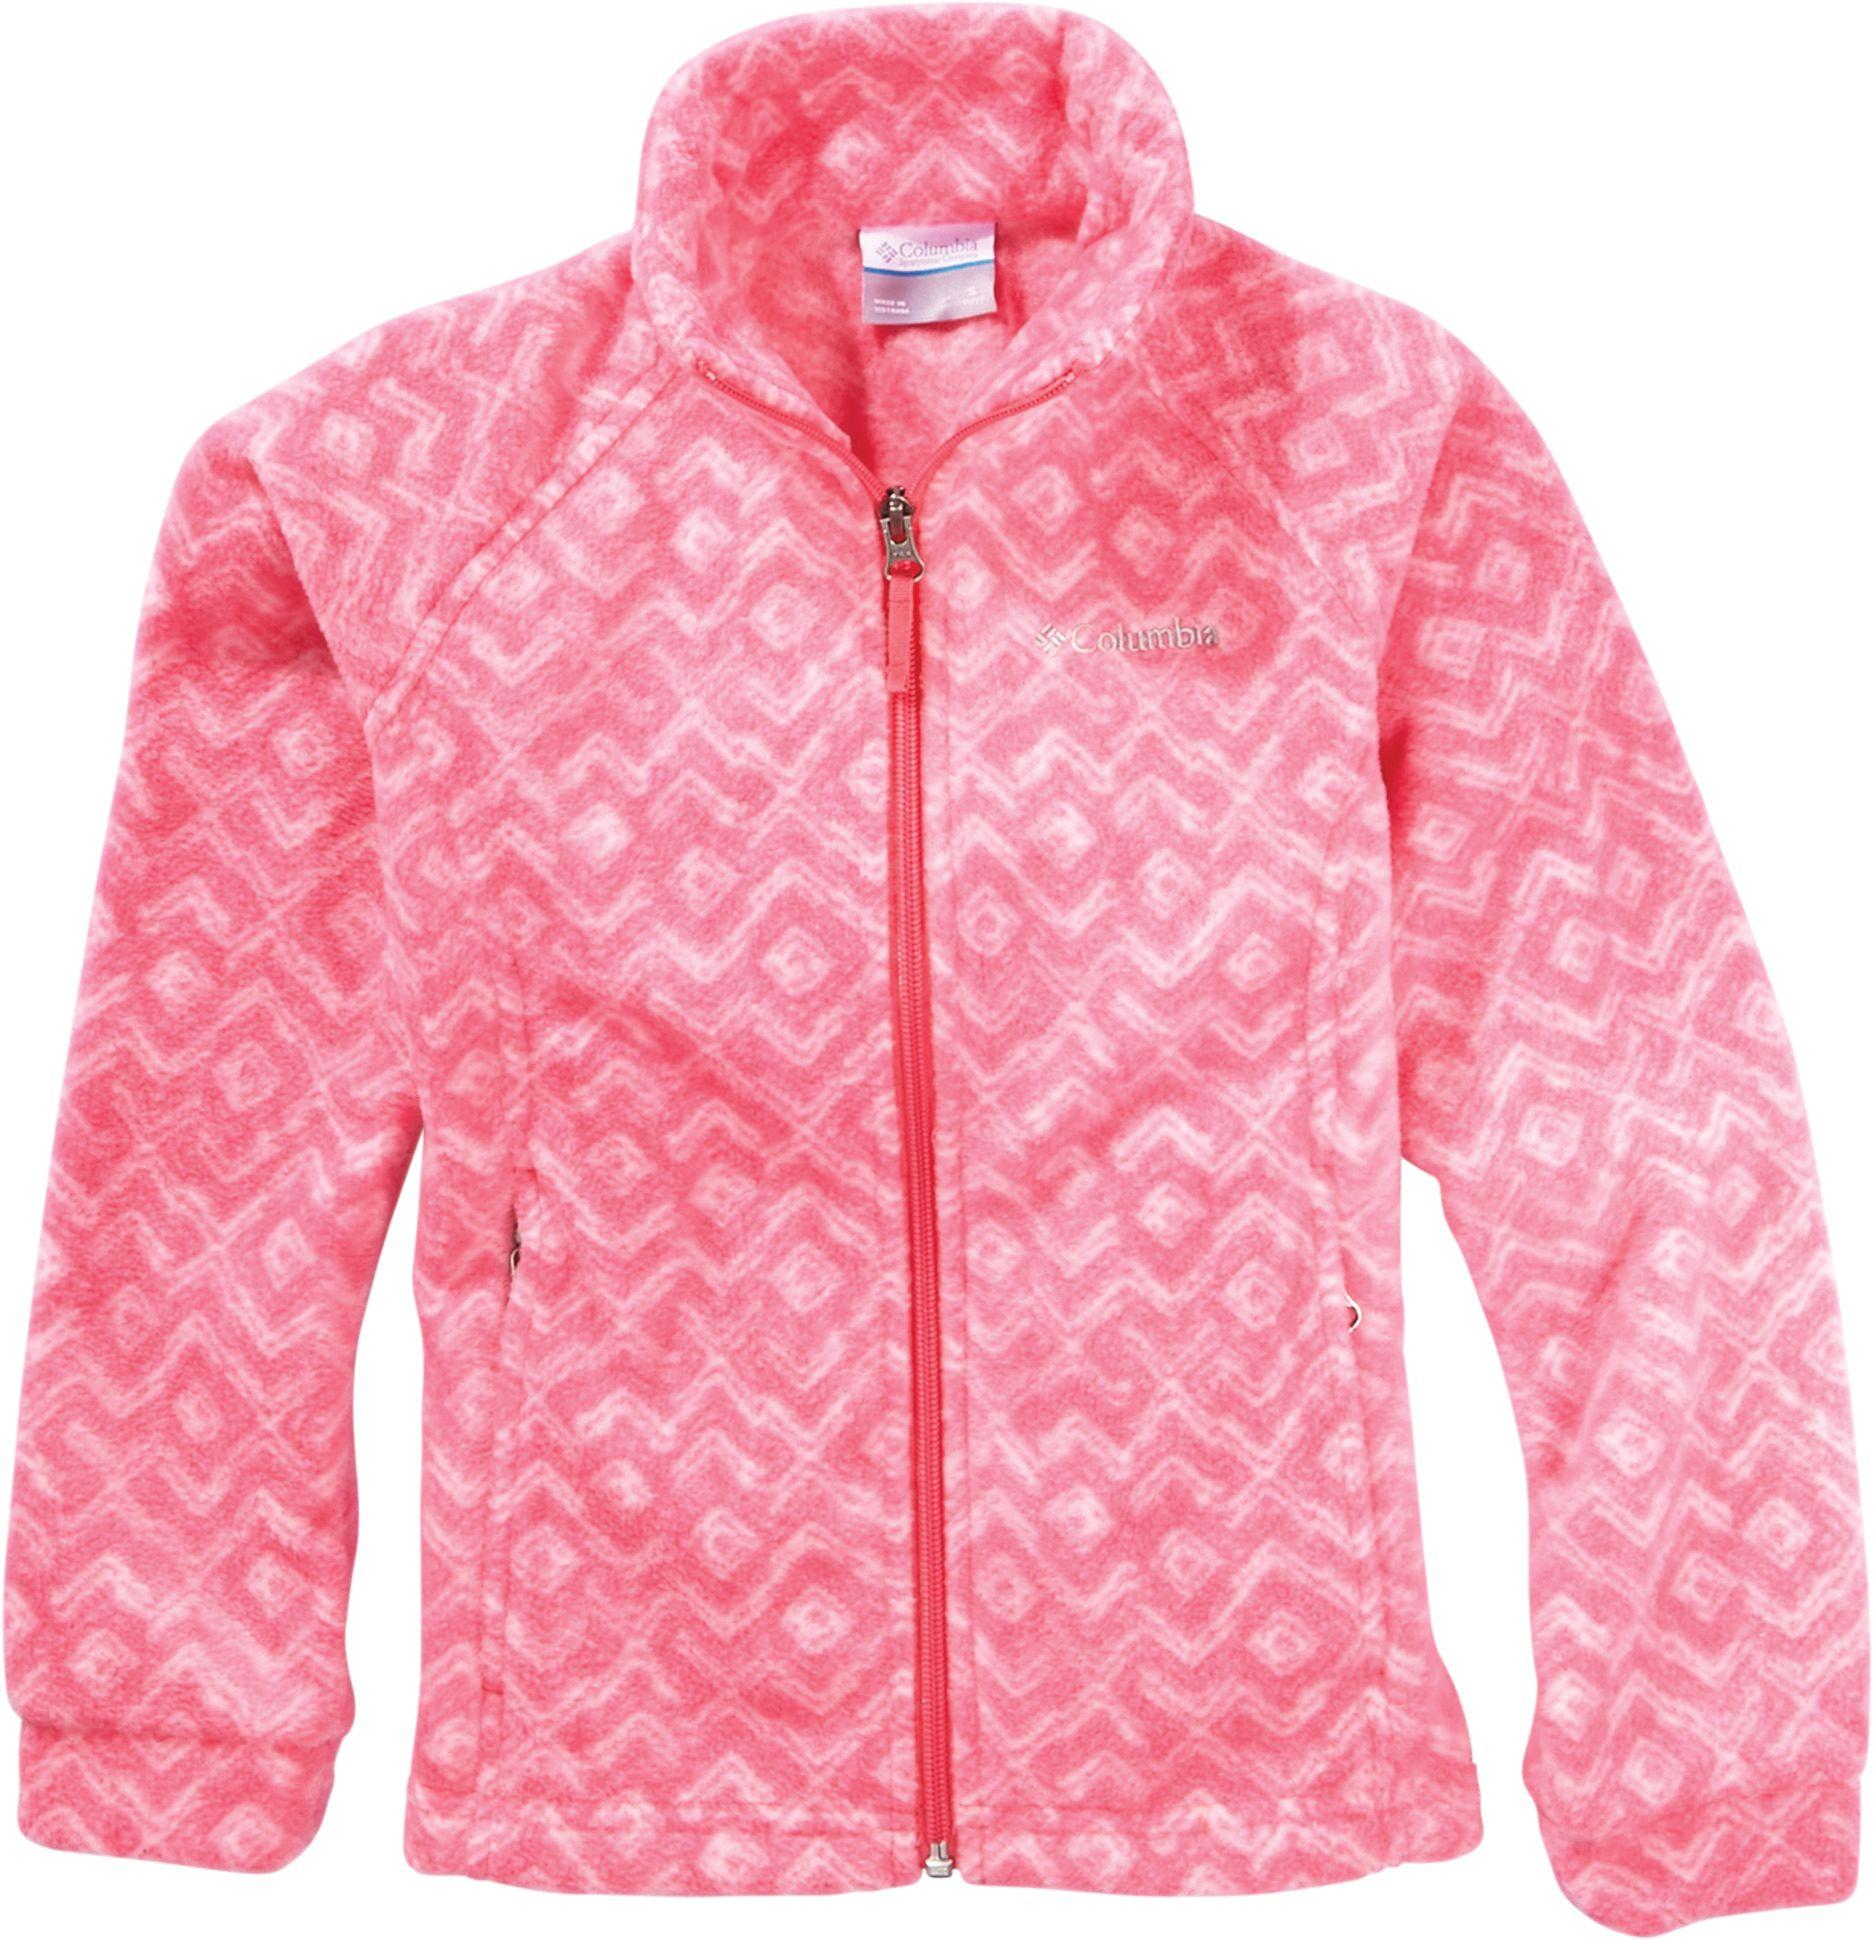 Columbia Girls Winter Coats - Tradingbasis